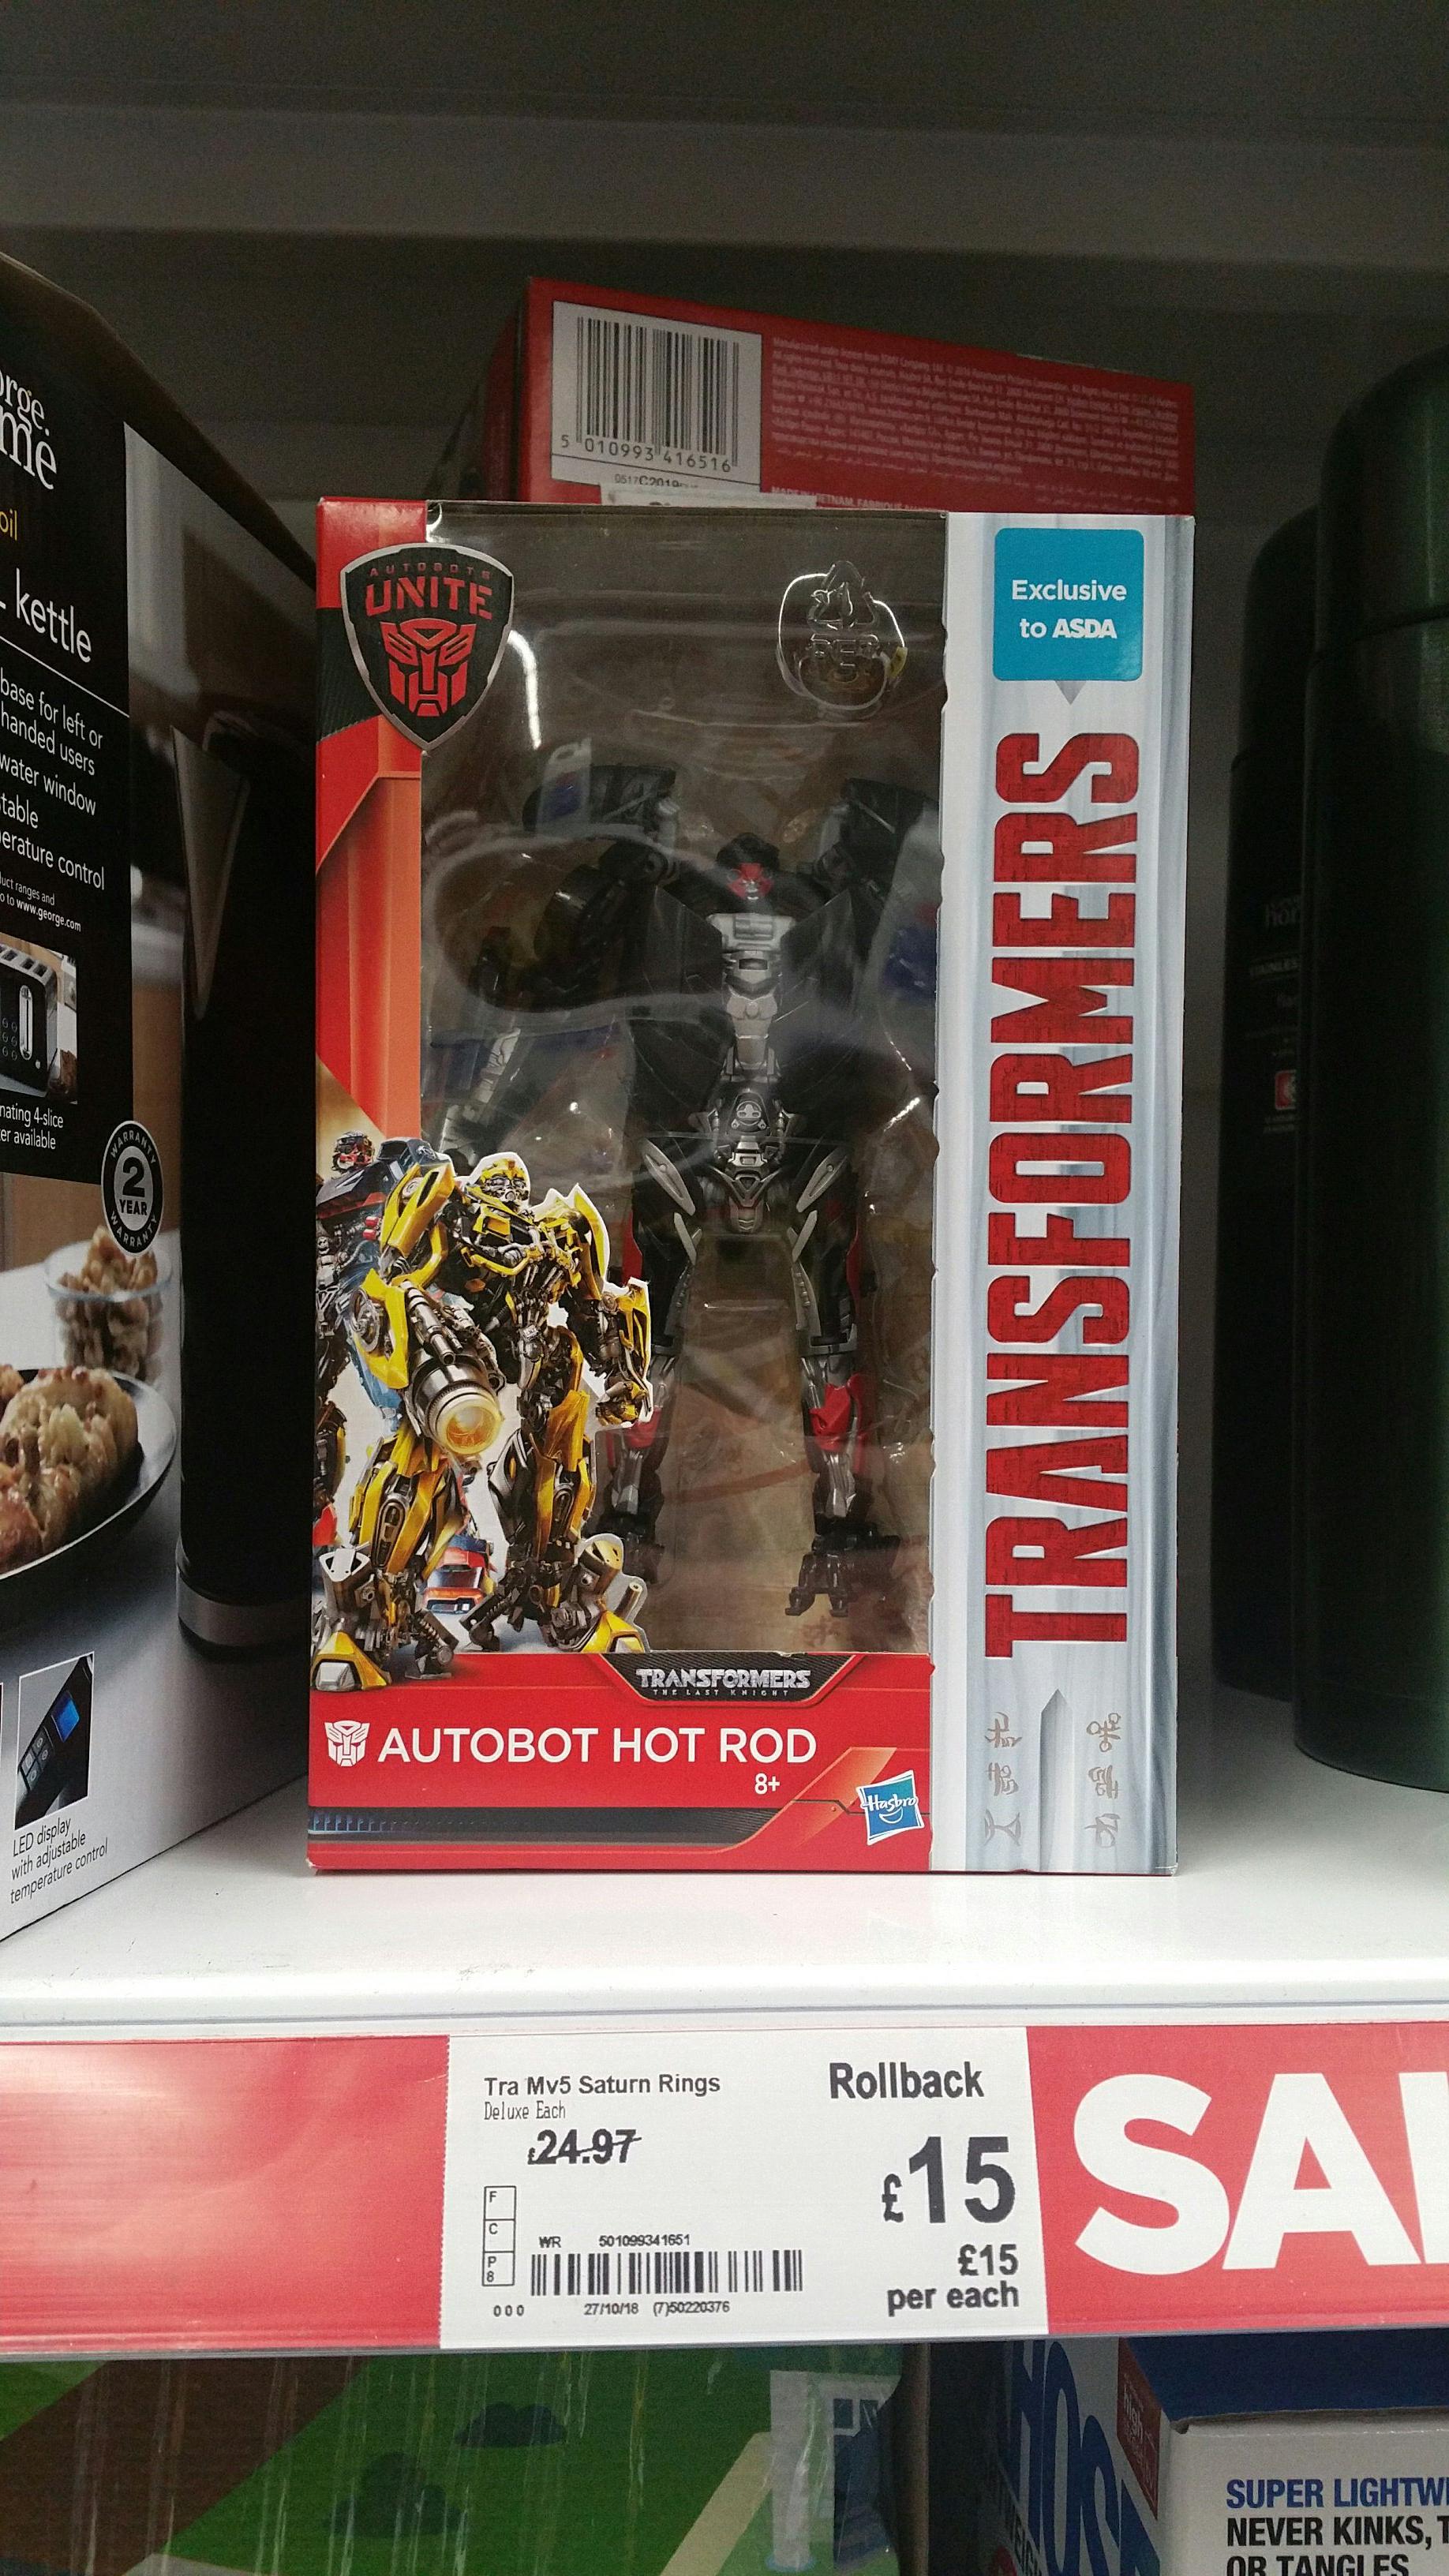 Transformers autobot hot rod instore at Asda (Irvine) for £15